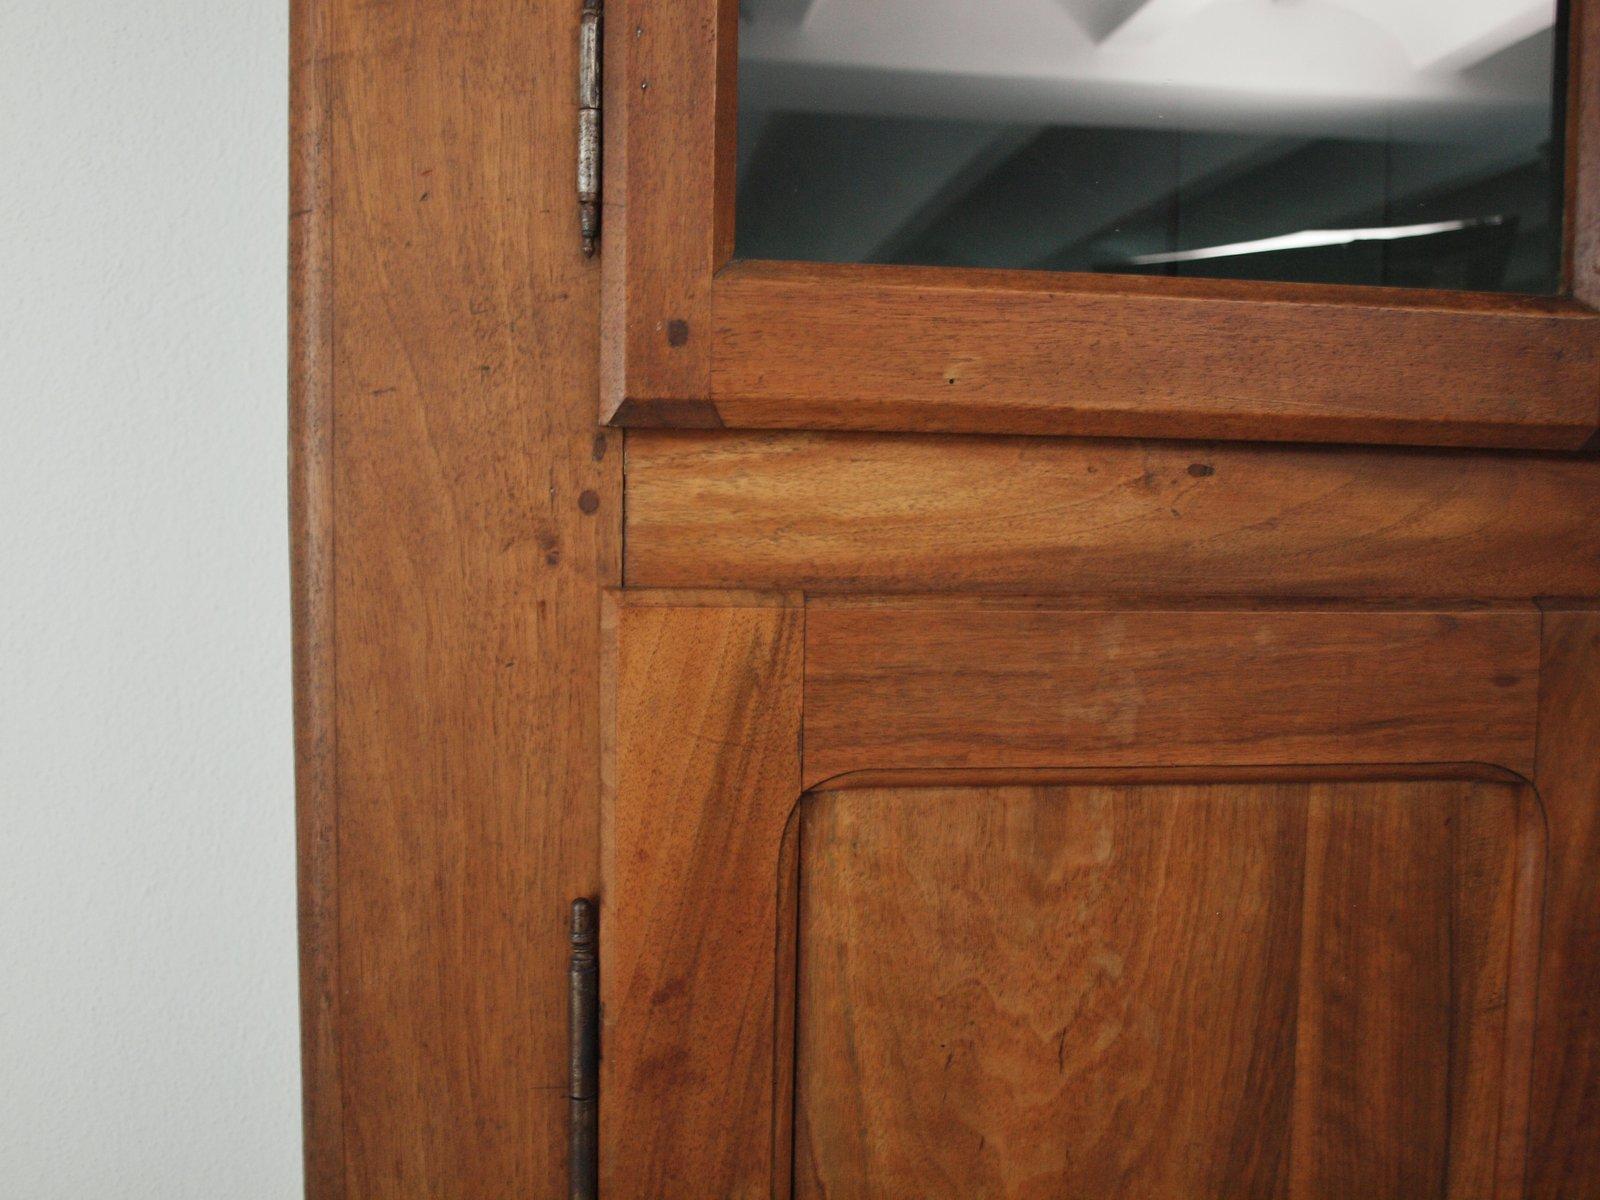 Mobile da cucina biedermeier in legno di noce e vetro